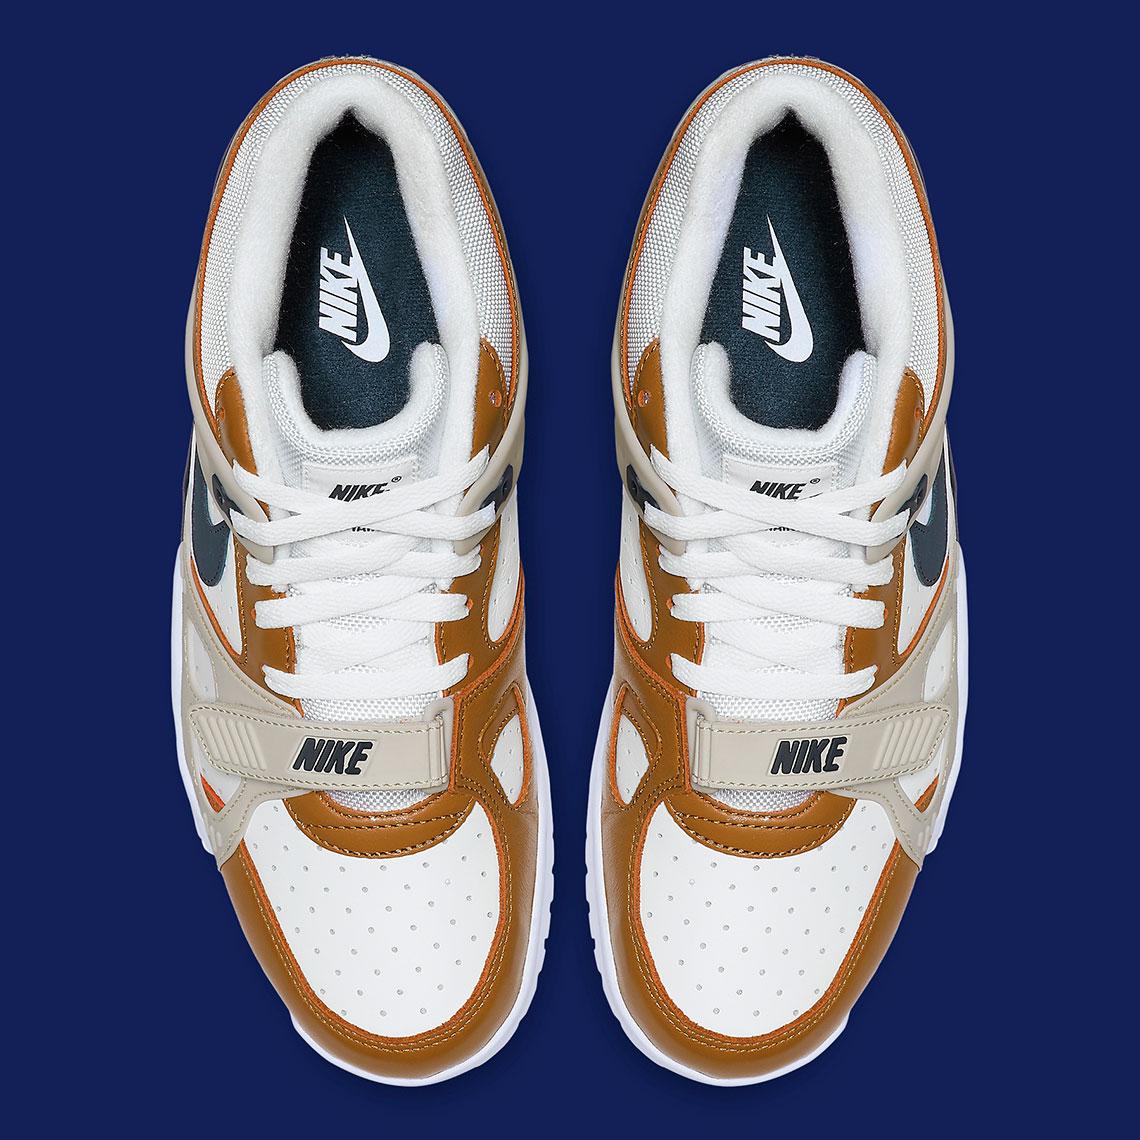 f7eeade002a8b Nike Air Trainer 3 Medicine Ball CJ1436-100 Release Date ...